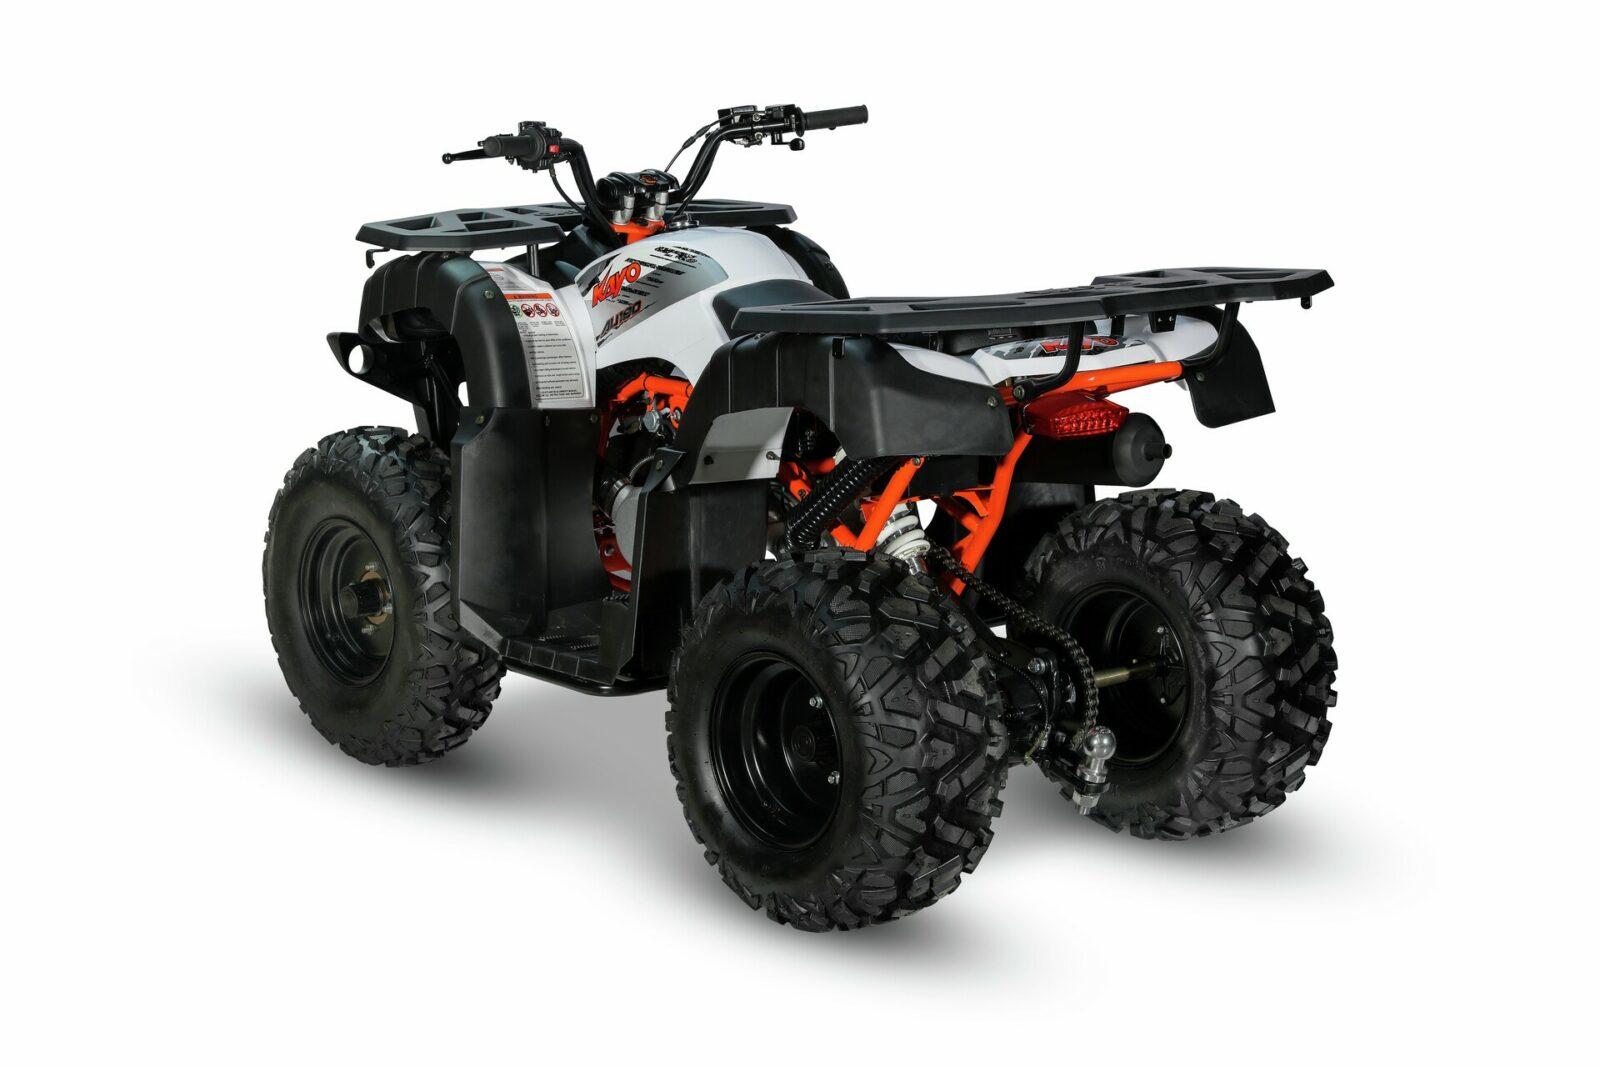 KAYO AU180 ATV 01943 1920